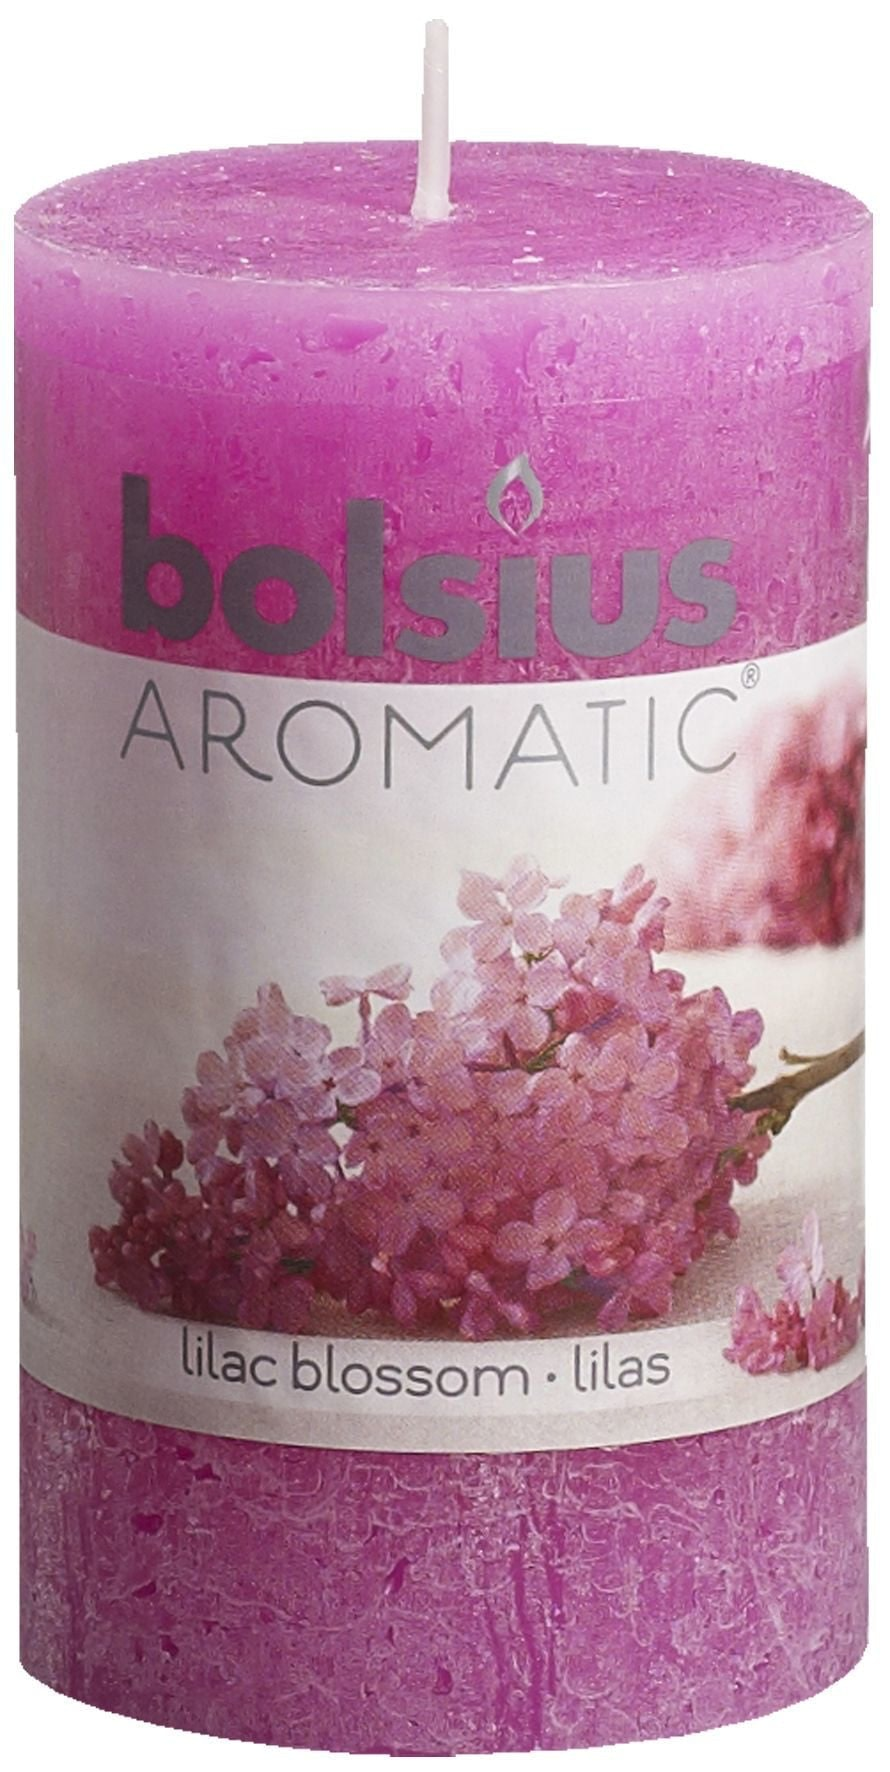 Geurstompkaars 100x58 cm Lilac Blossom